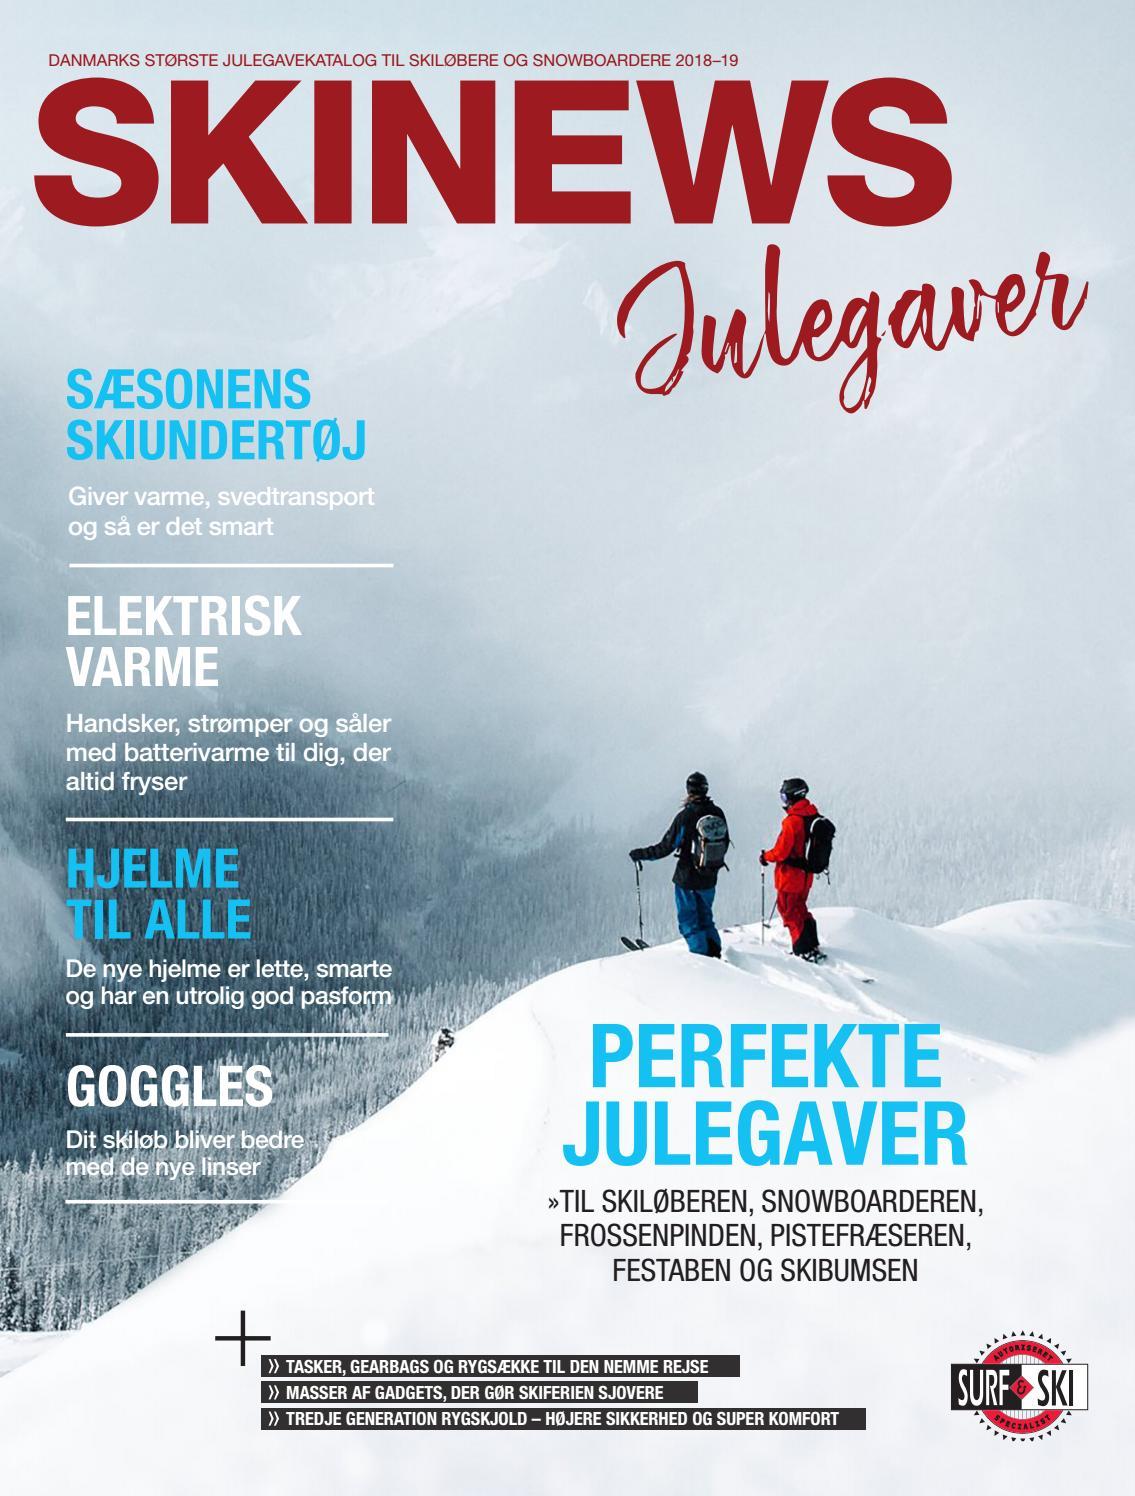 346a2fa5319 SKI NEWS JULEGAVE EDITION | Gumpel & Co. by Gumpel & Co. - issuu